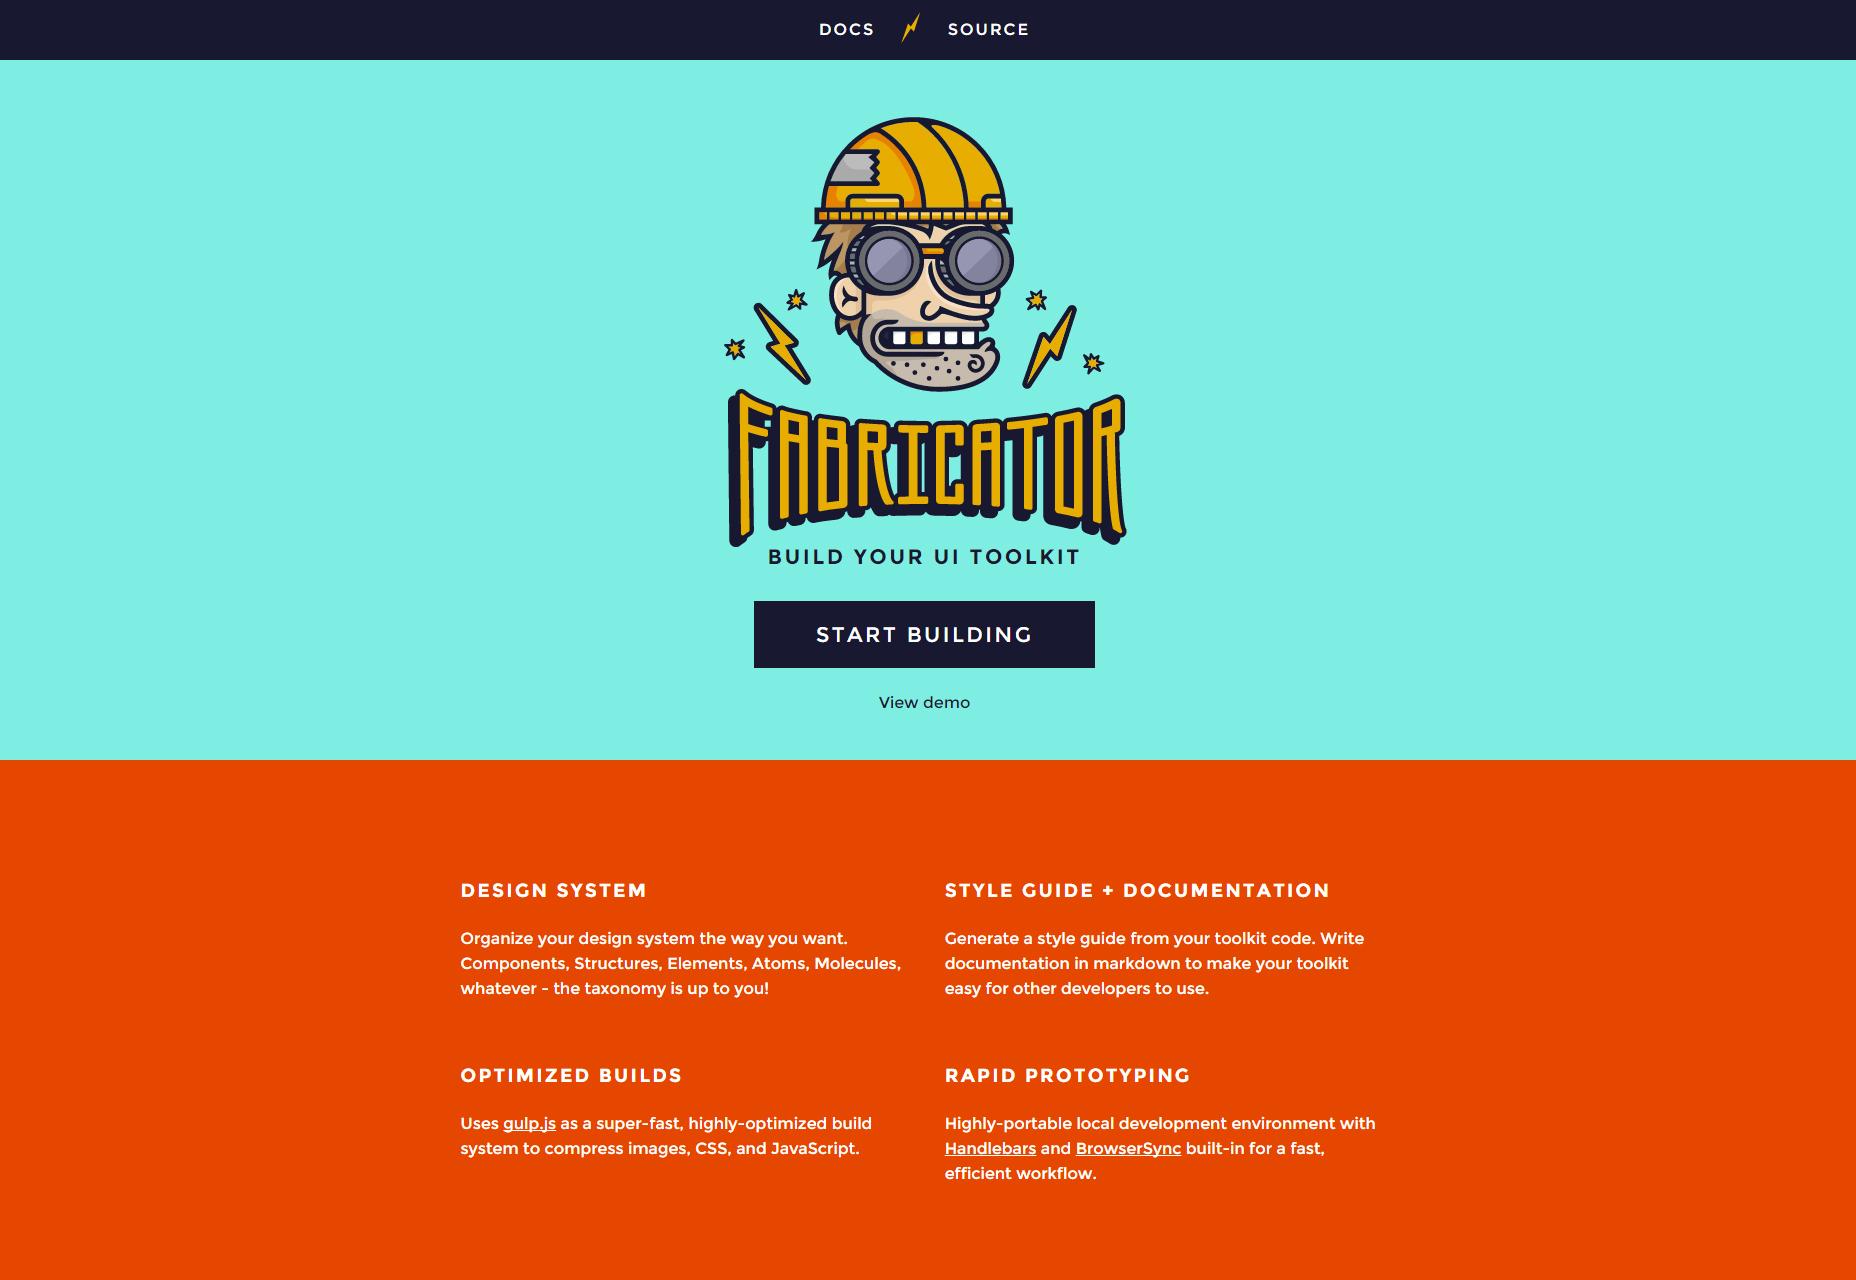 Fabricator: NodeJS UI Toolkit Builder